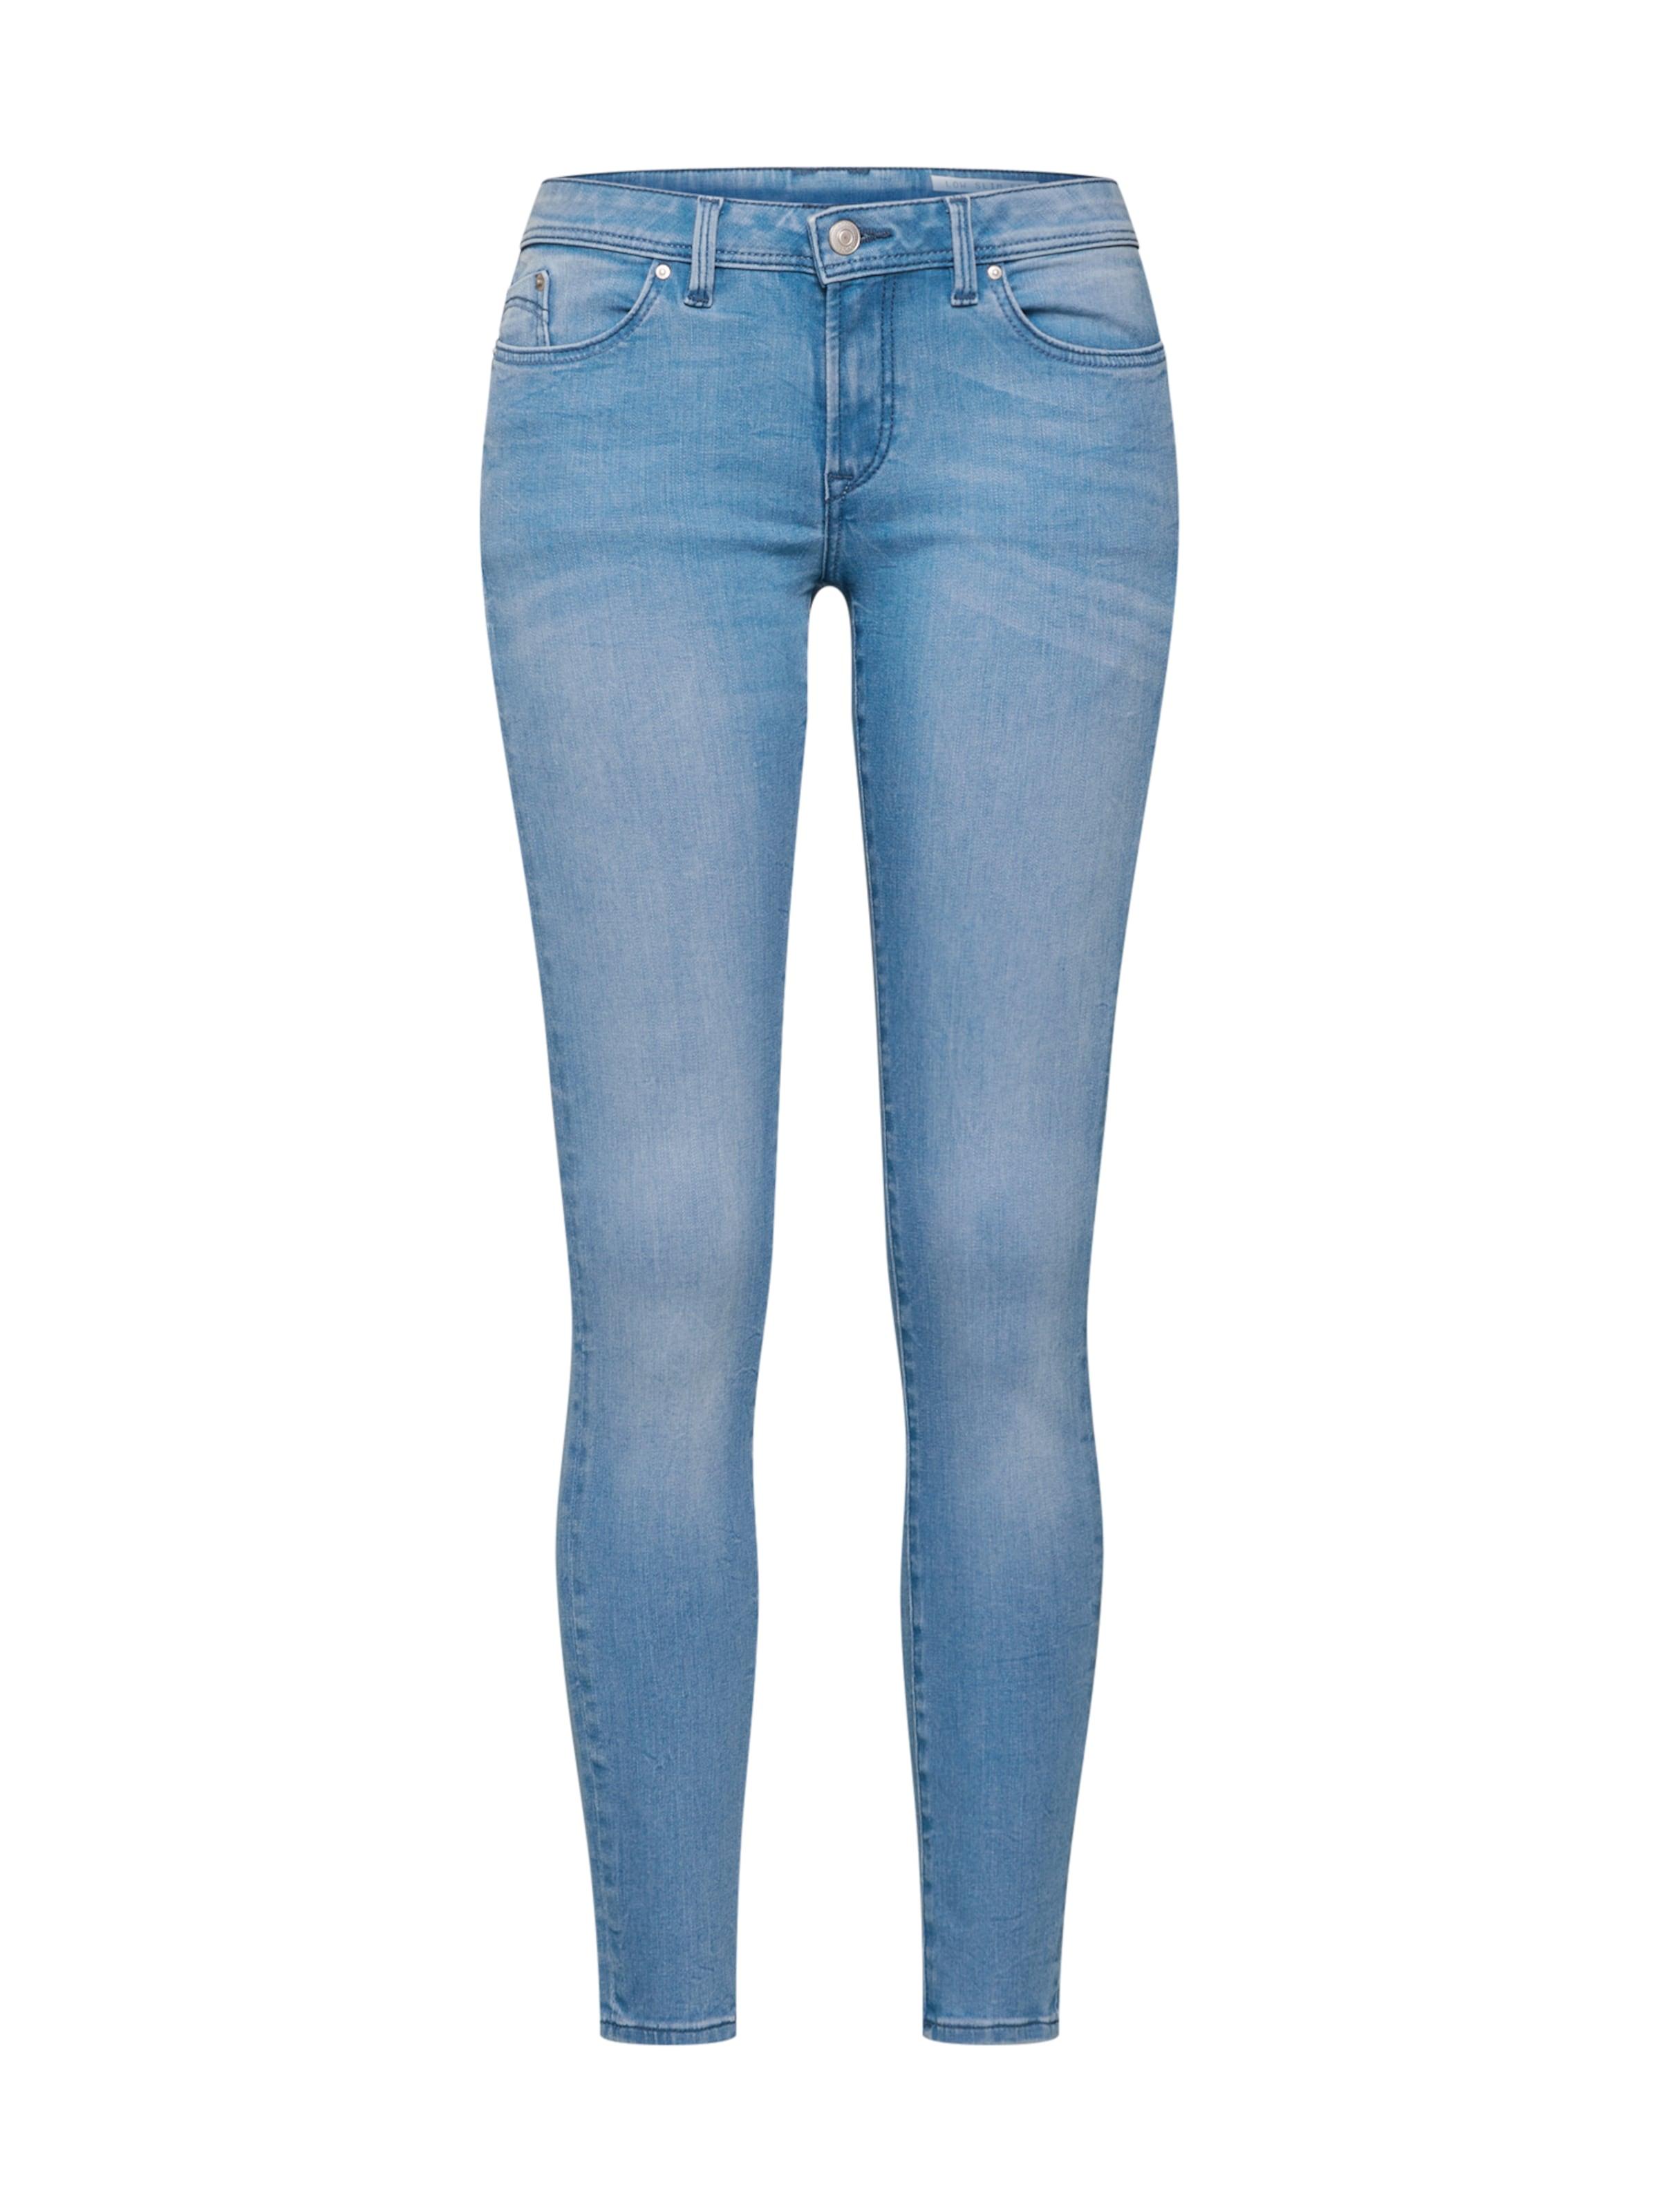 Jeans Esprit In Denim Edc By 'rcs Lr' Blue ohrdCxBtsQ